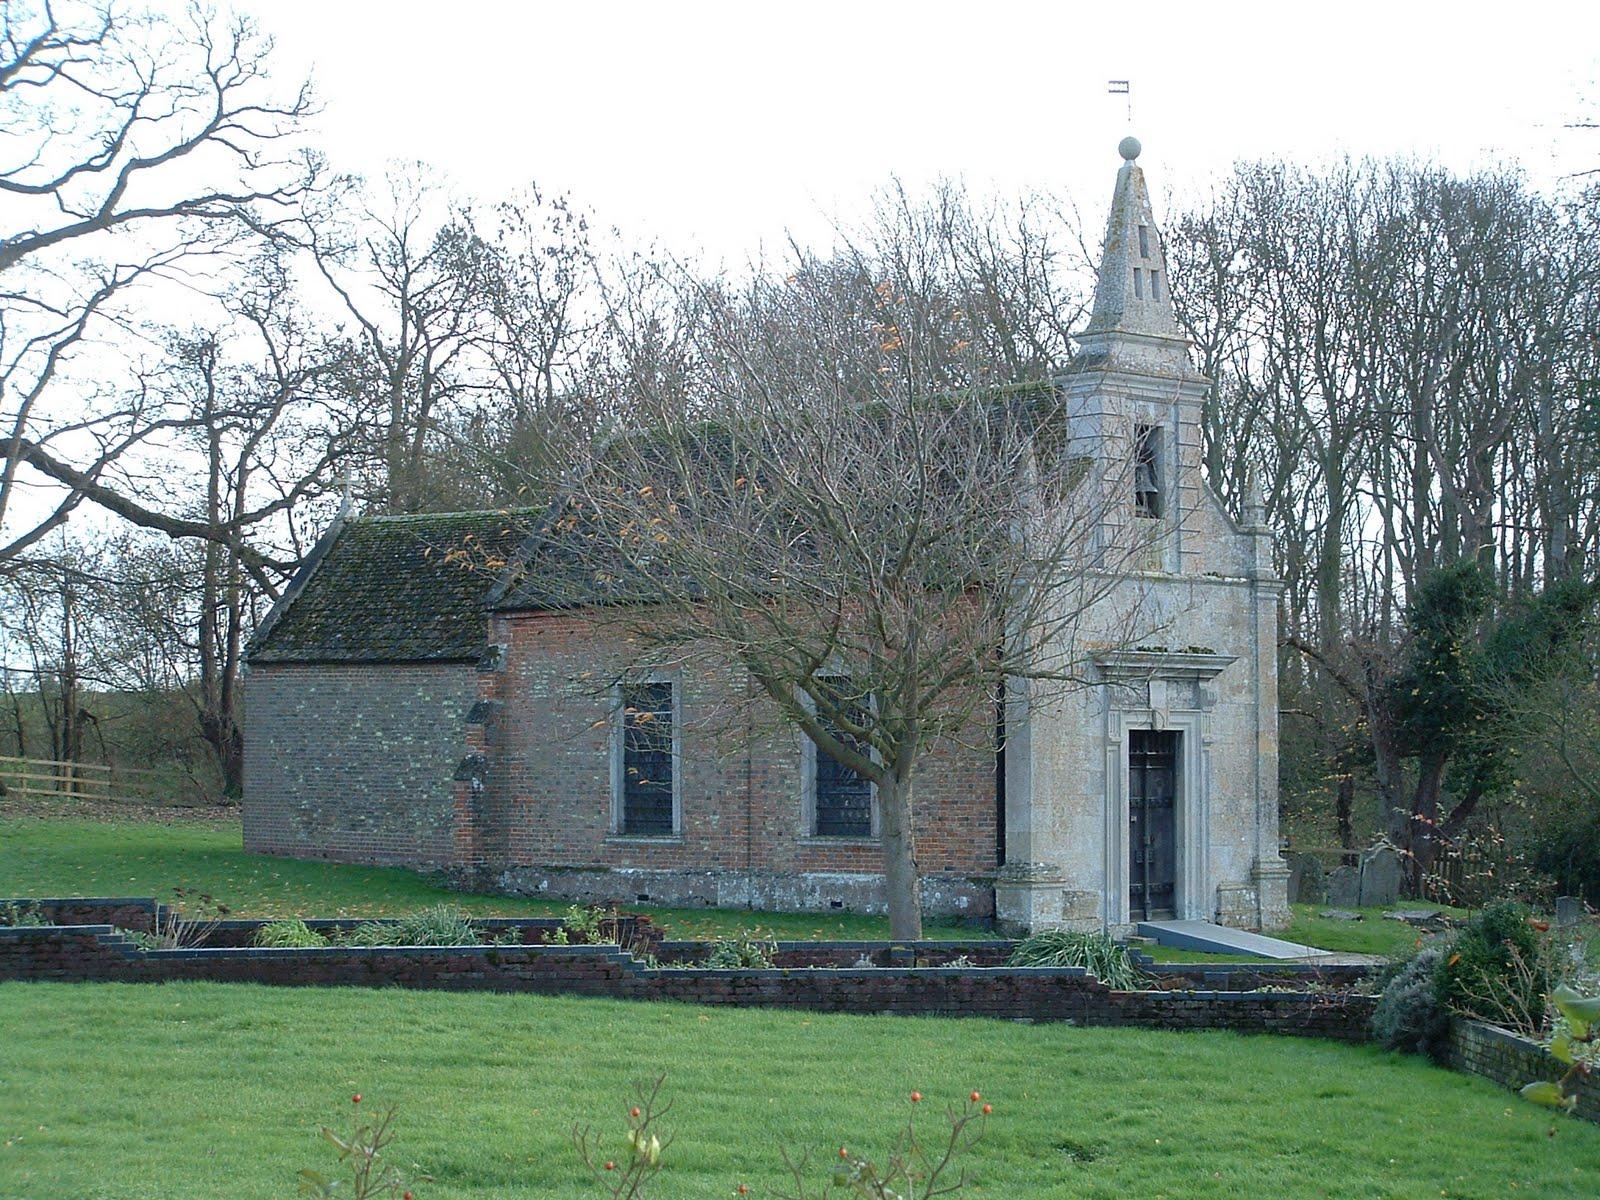 The Church of St. John the Evangelist, Little Gidding, Huntingdonshire, England